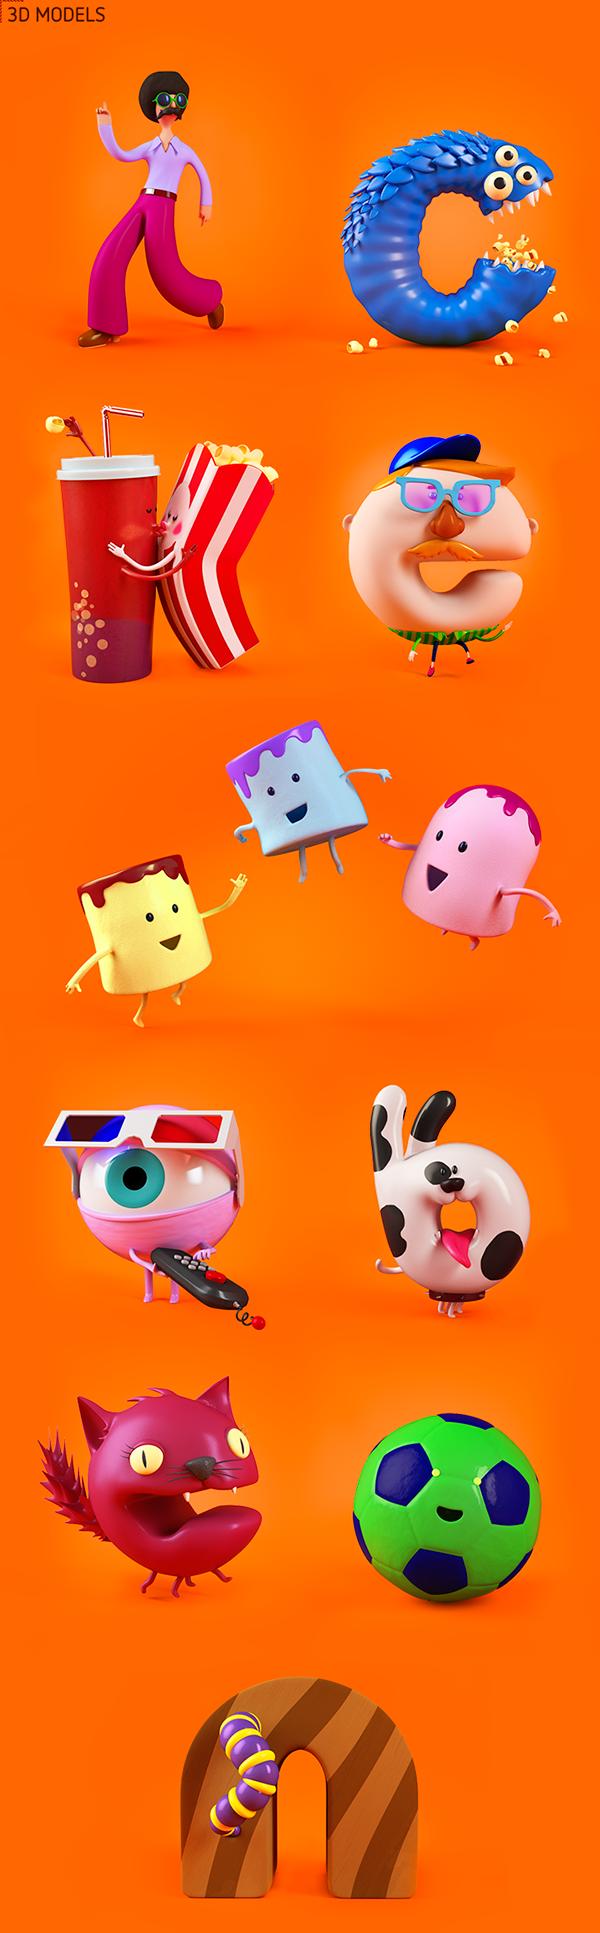 "Nickelodeon ""Popcorn"" by Berd"